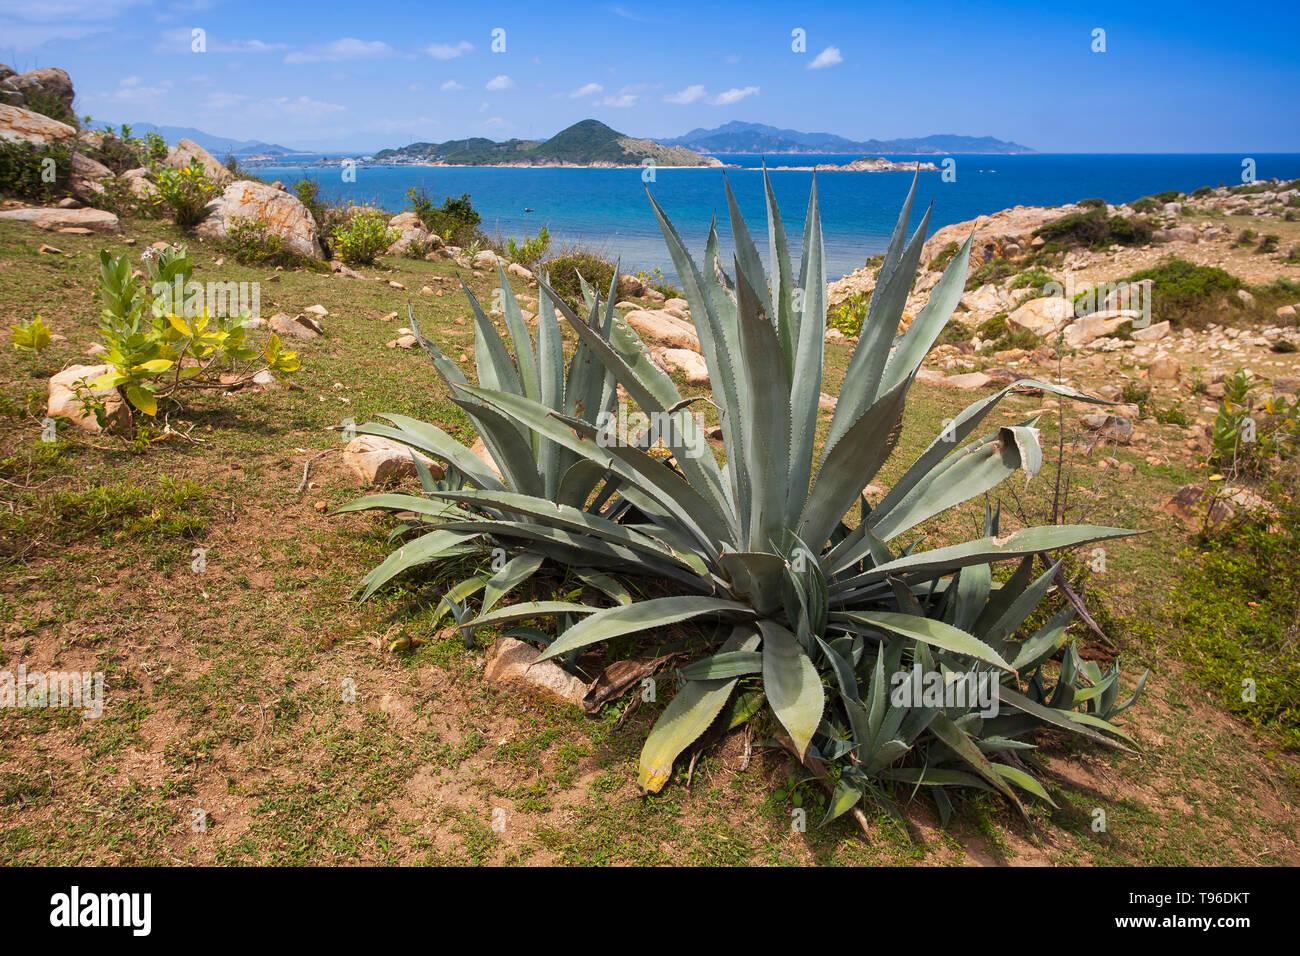 Cactus in Rocky coast landscape at Vinh Hy, South China Sea,Ninh Thuan, Vietnam - Stock Image